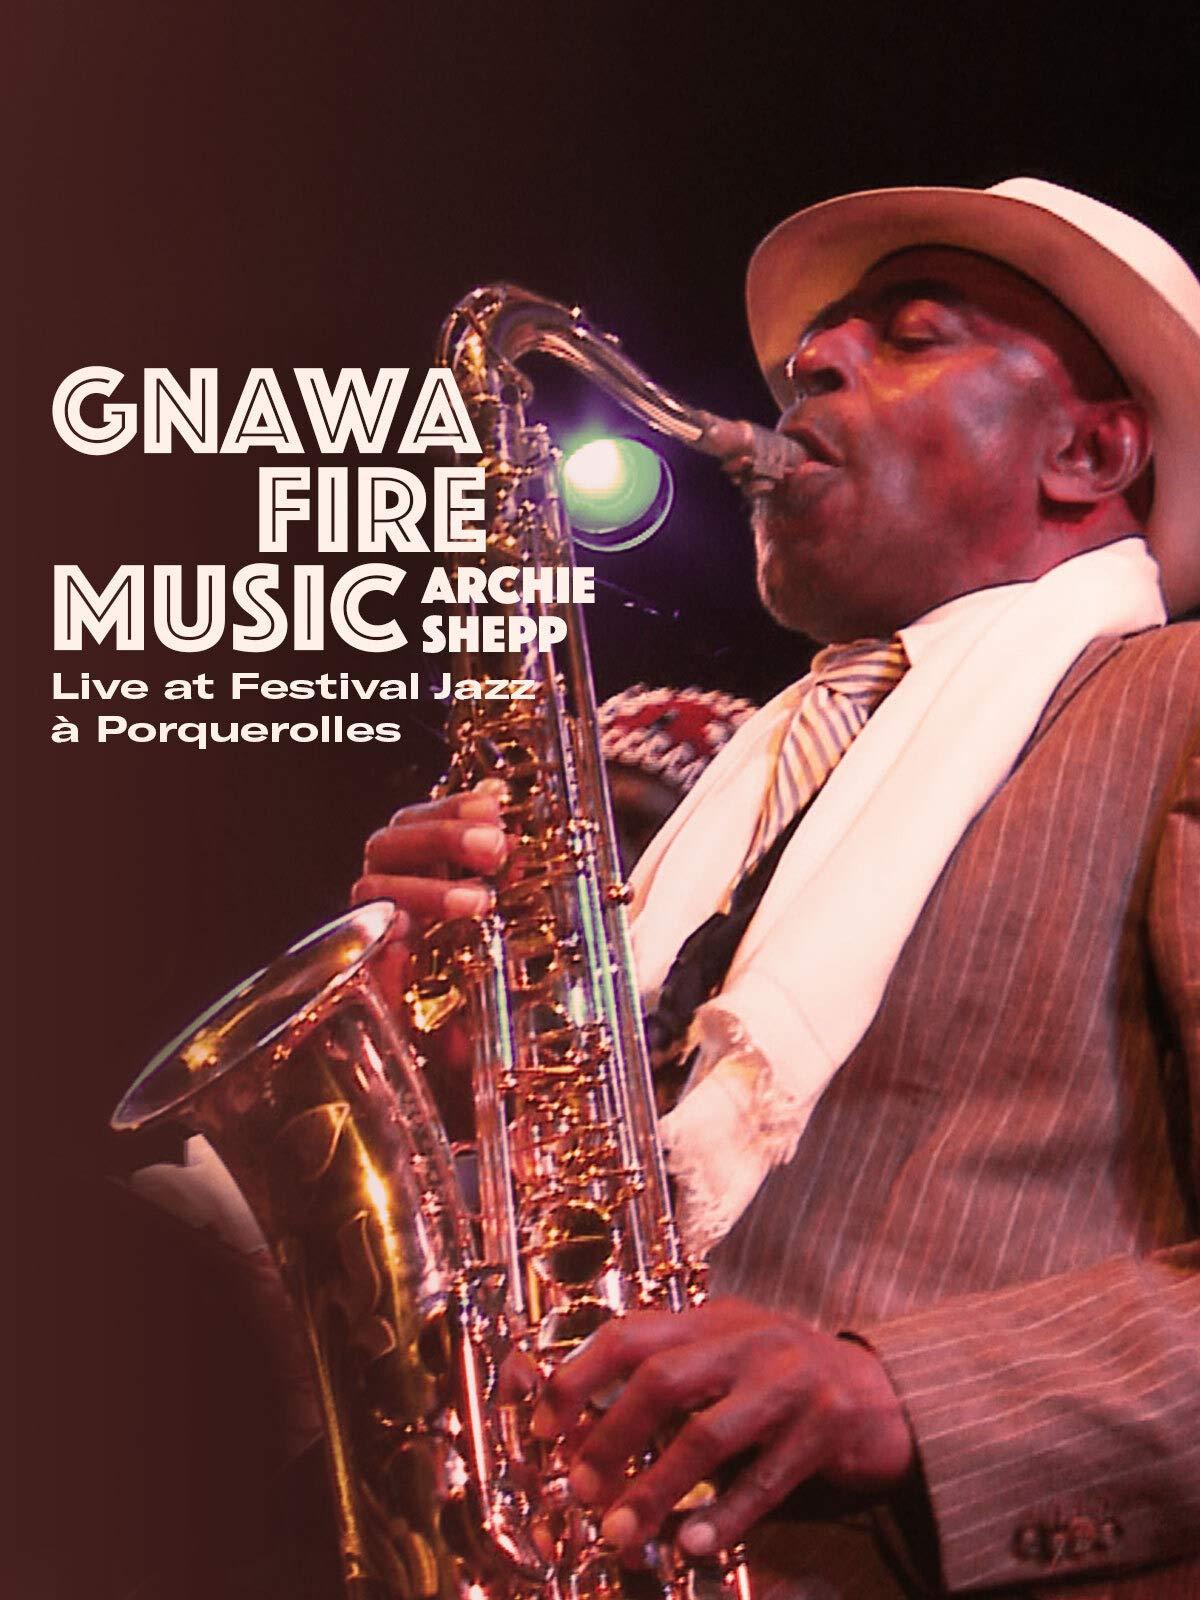 Gnawa Fire Music & Archie Shepp - Porquerolles